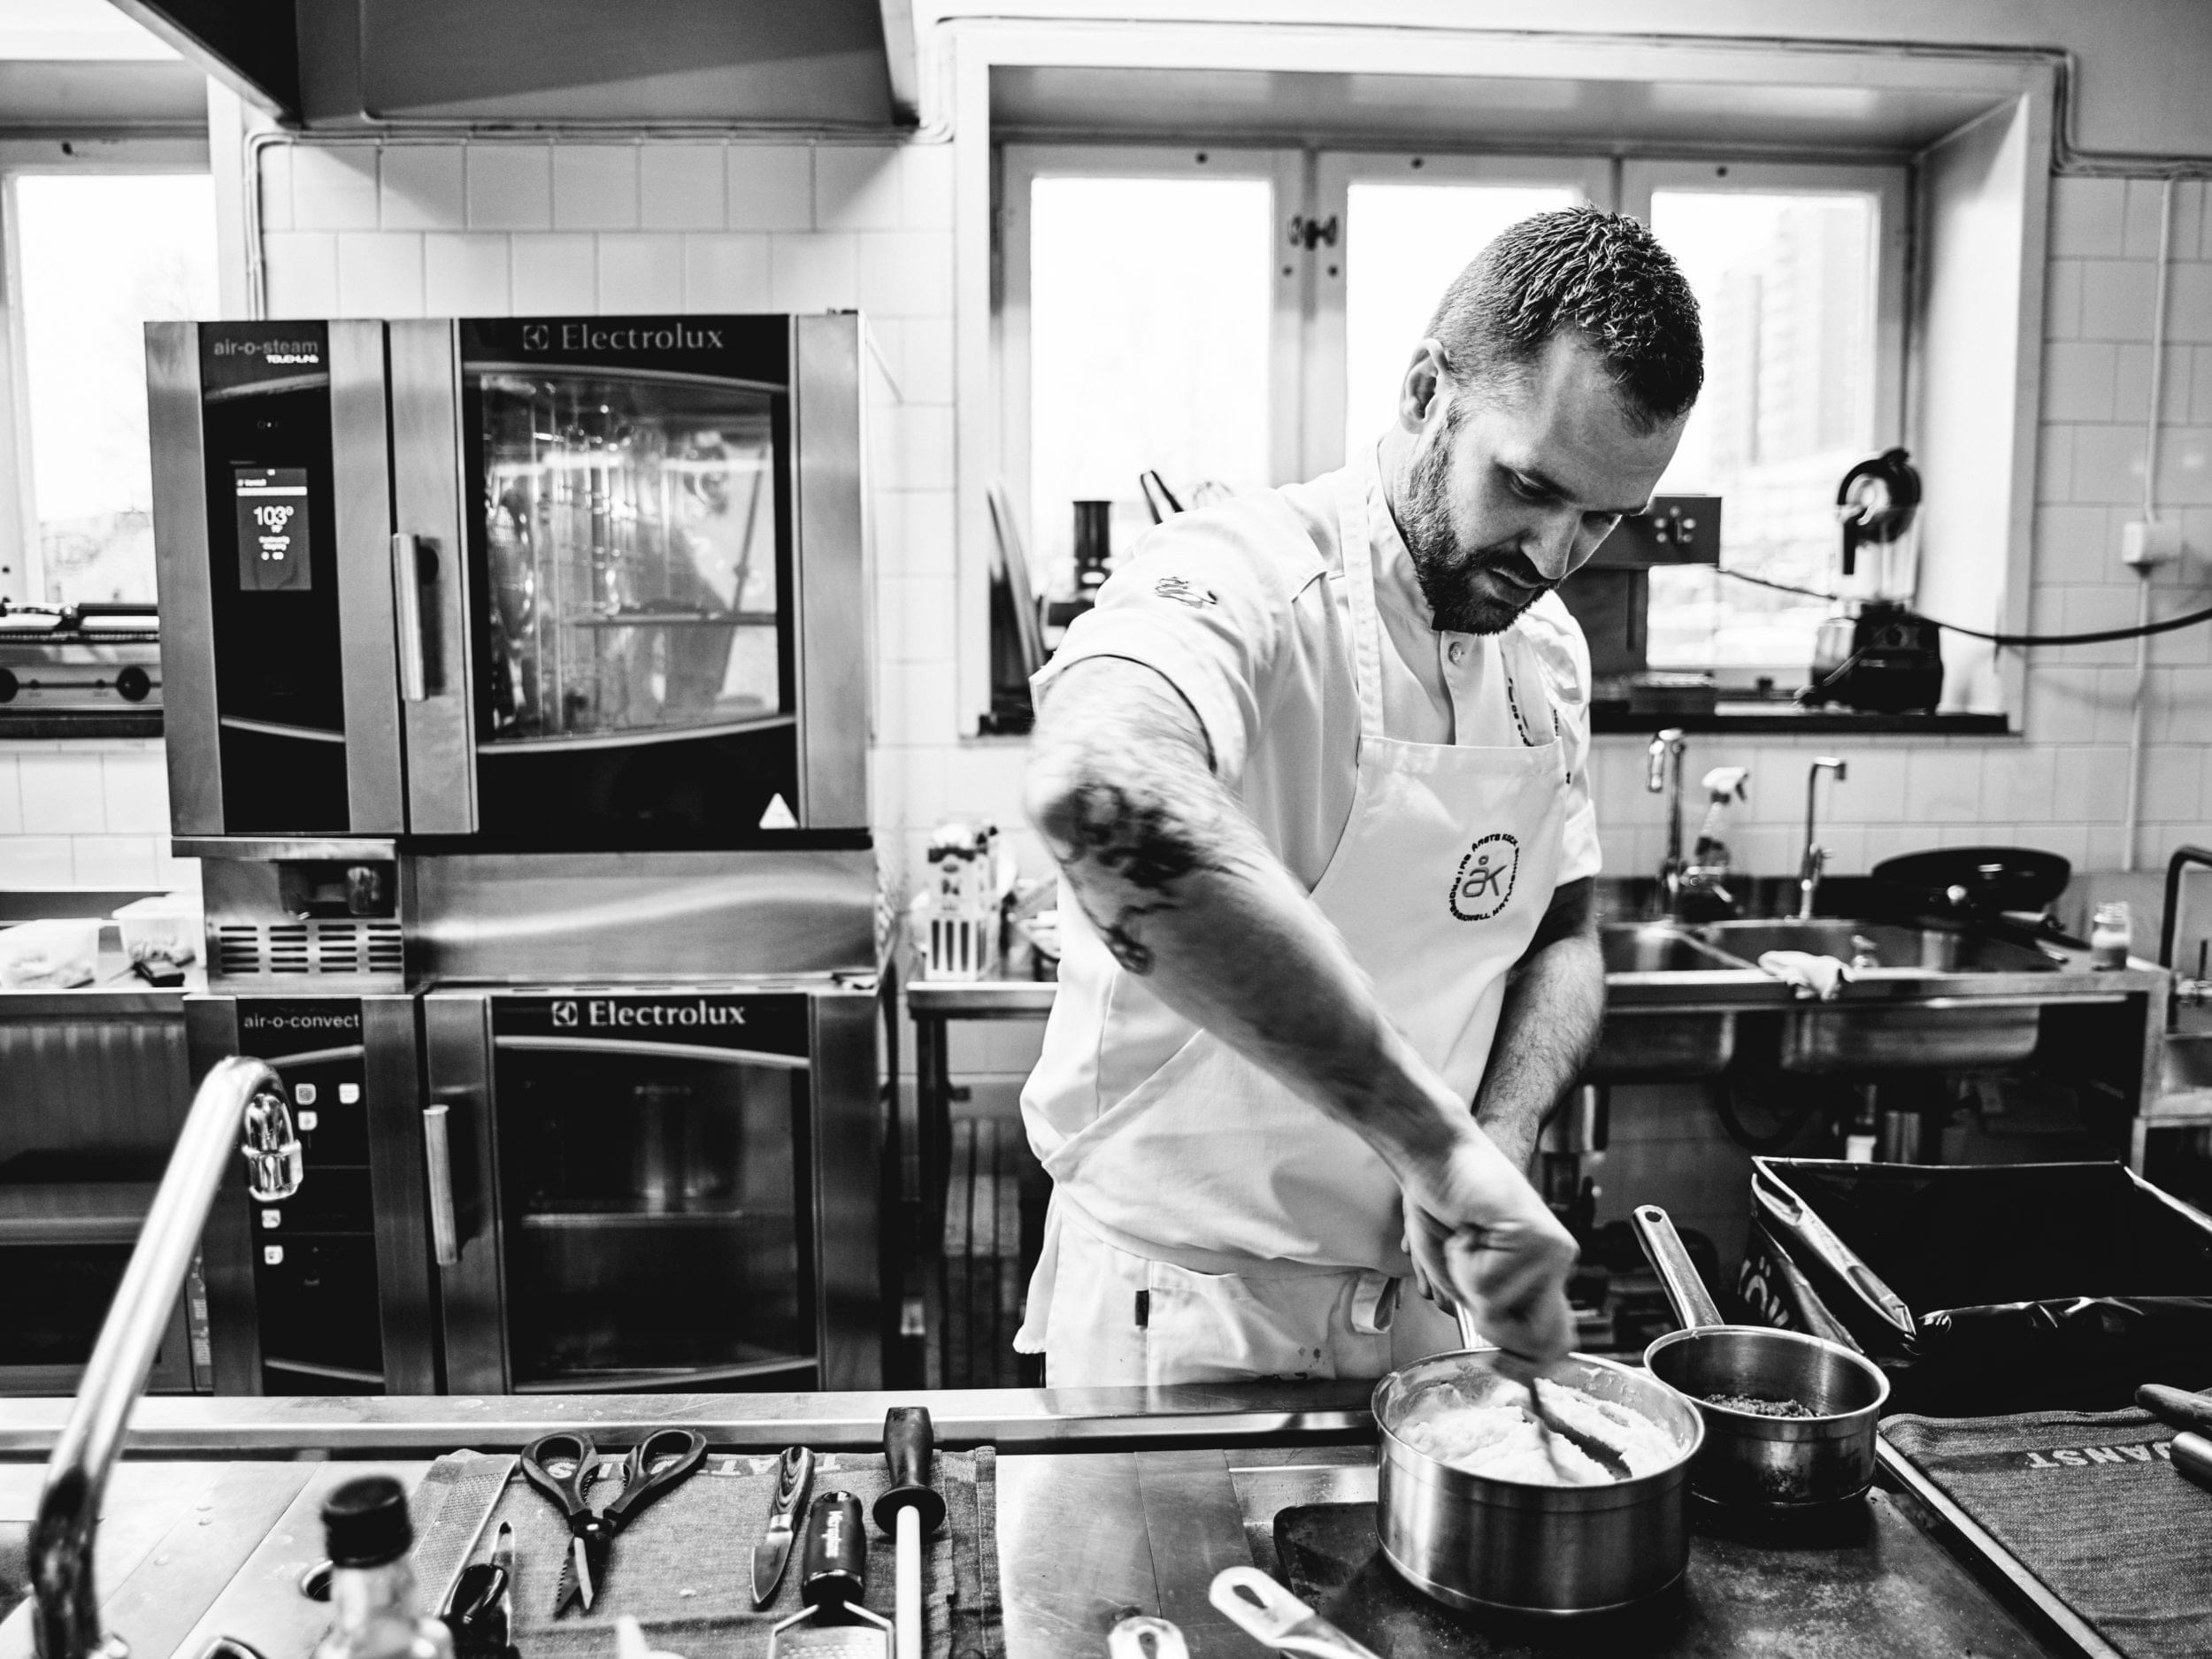 David Lundqvist, chef of the year 2018